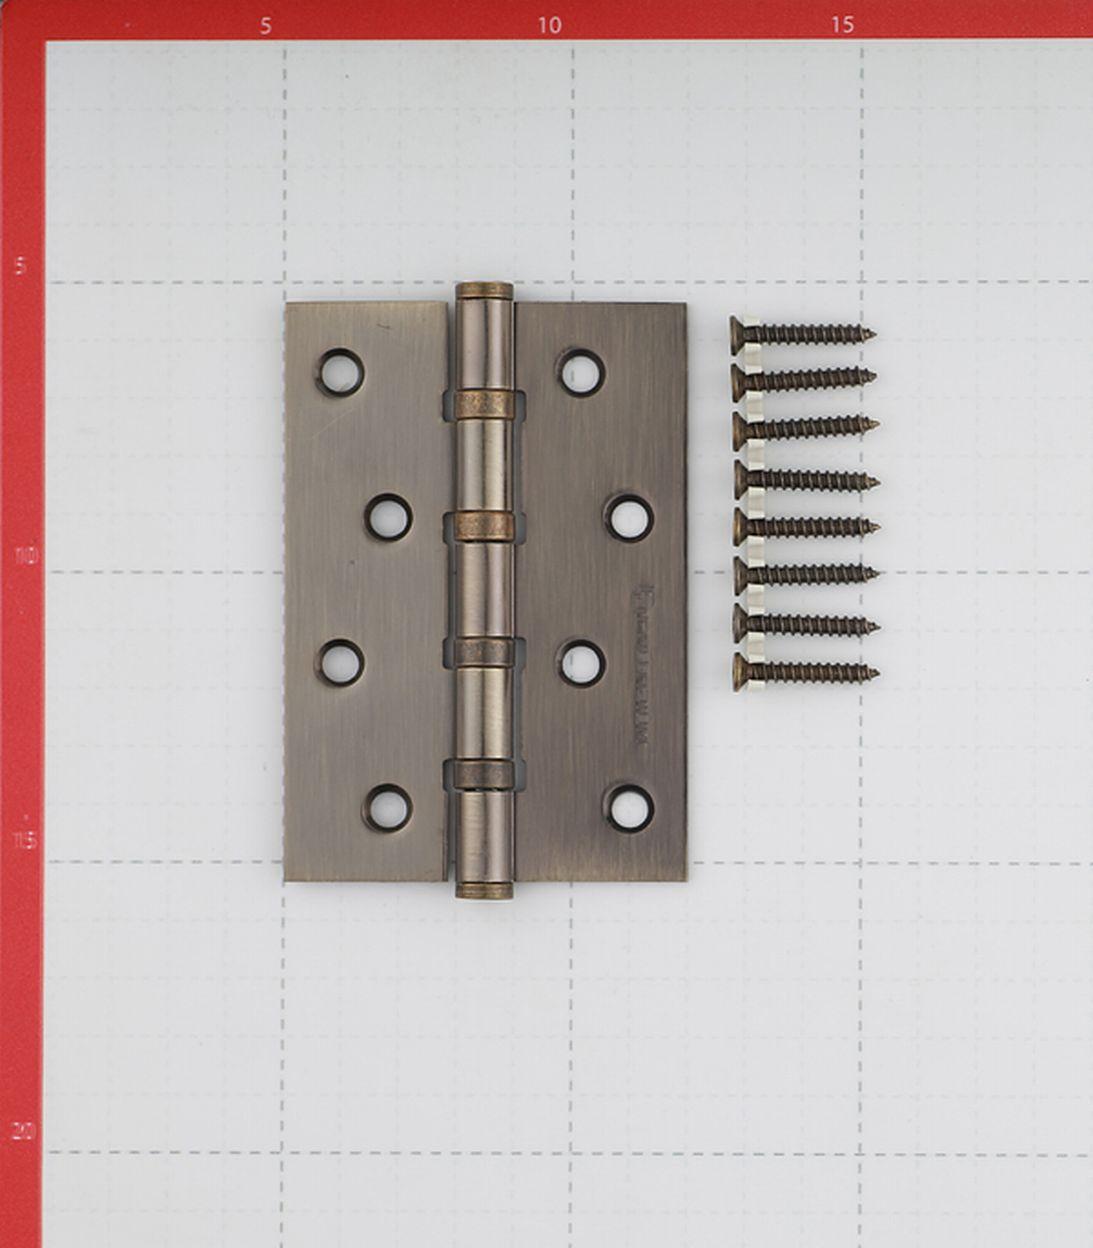 Петля Palladium N 4BB-100 AB универсальная неразъемная 100х70x2 мм бронза